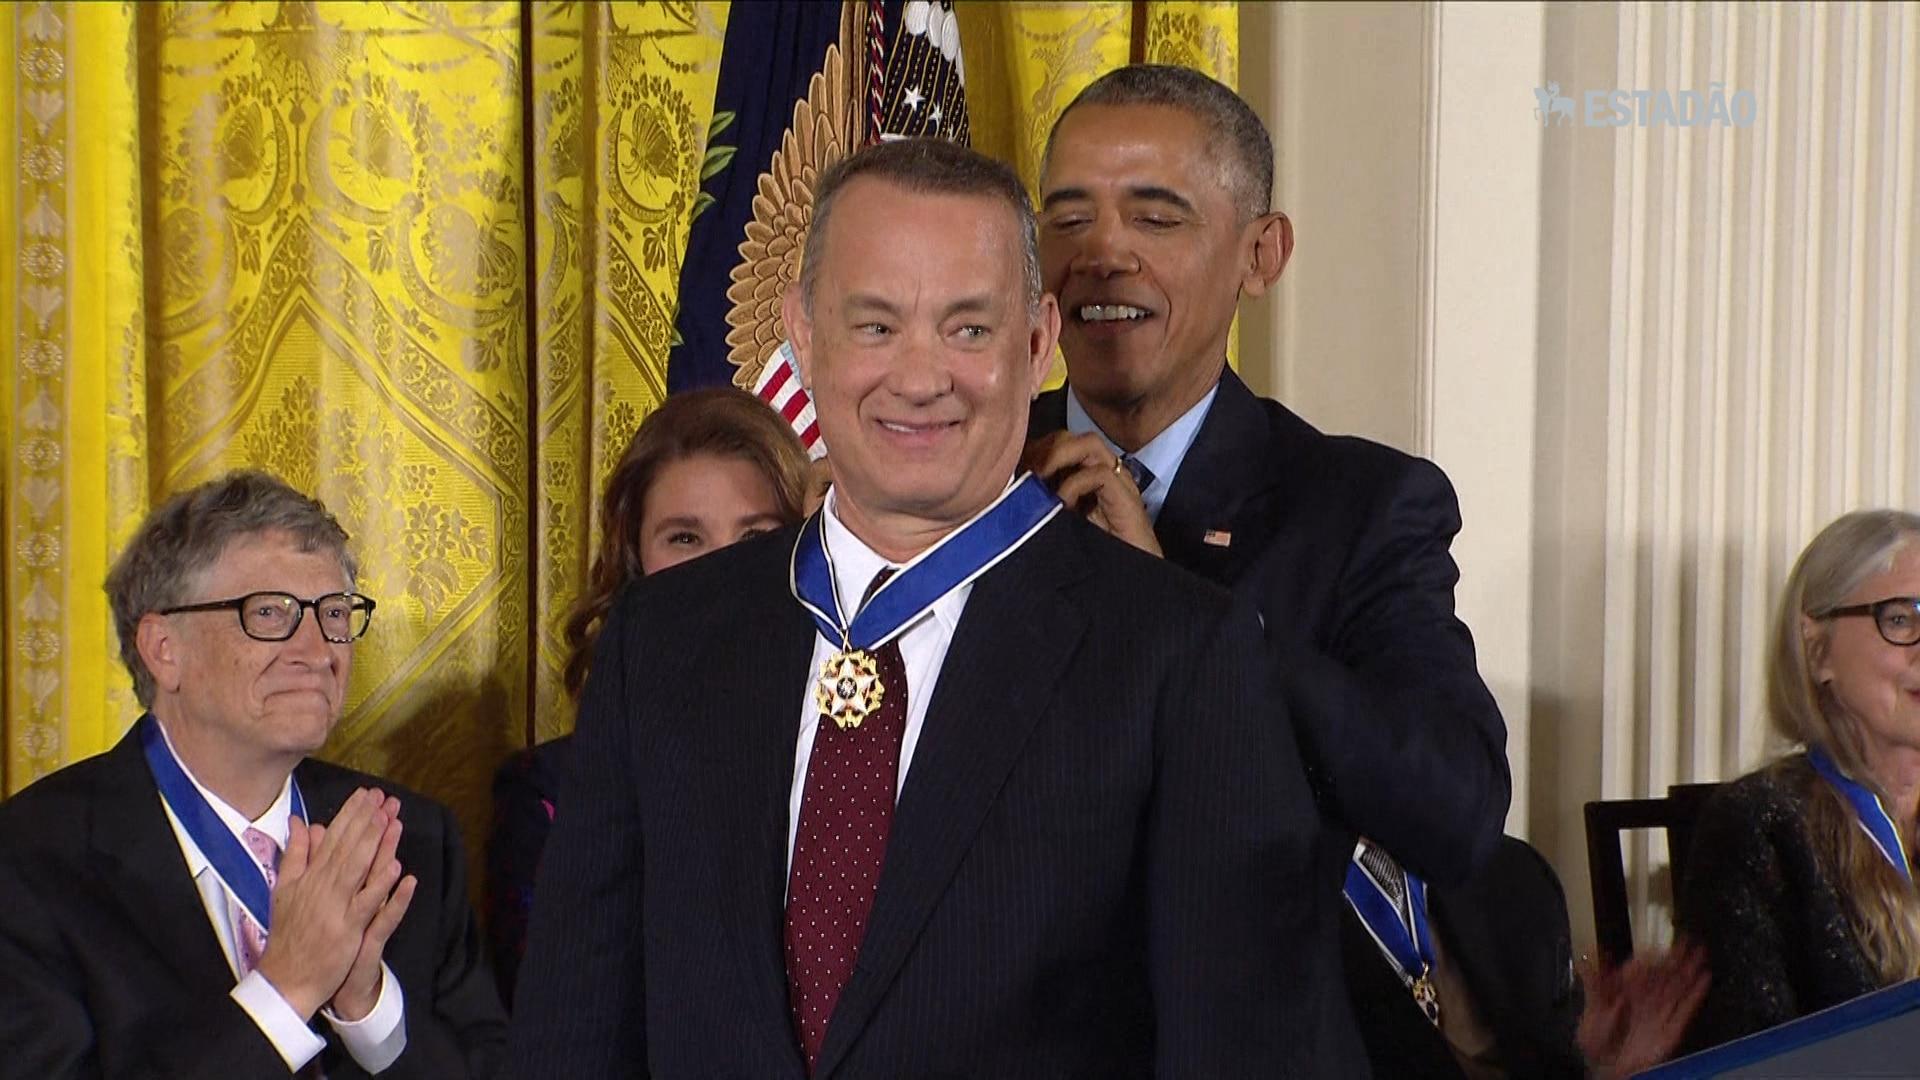 Personalidades recebem Medalha da Liberdade na Casa Branca